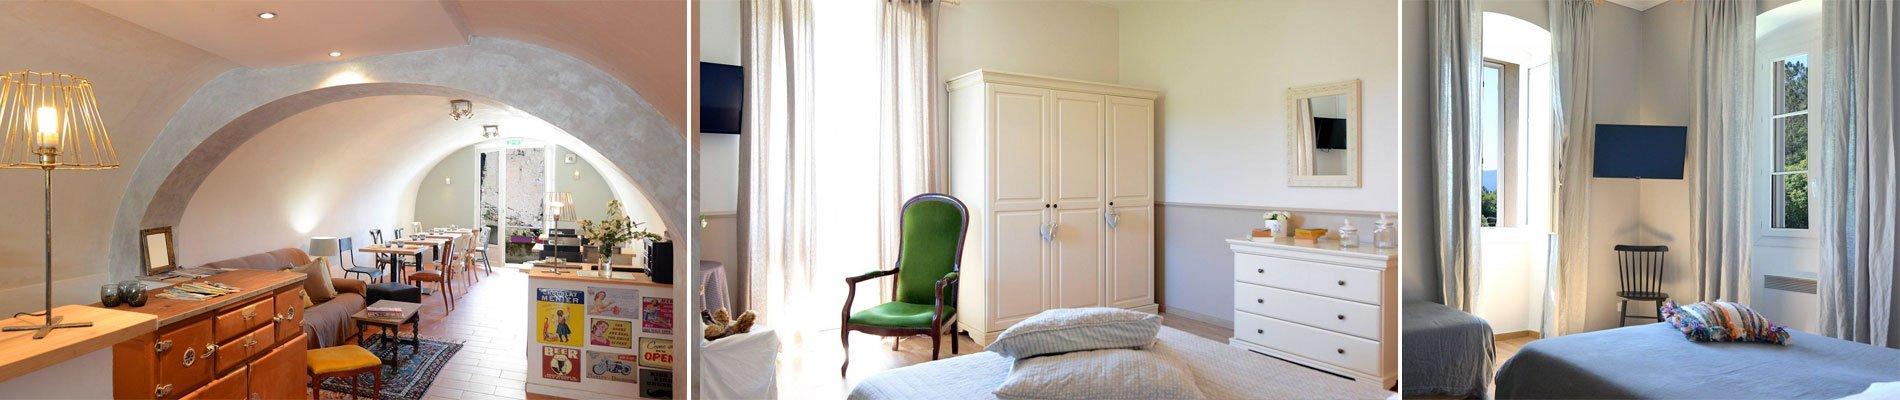 hotel-u-frascone-corte-corsica-reizen